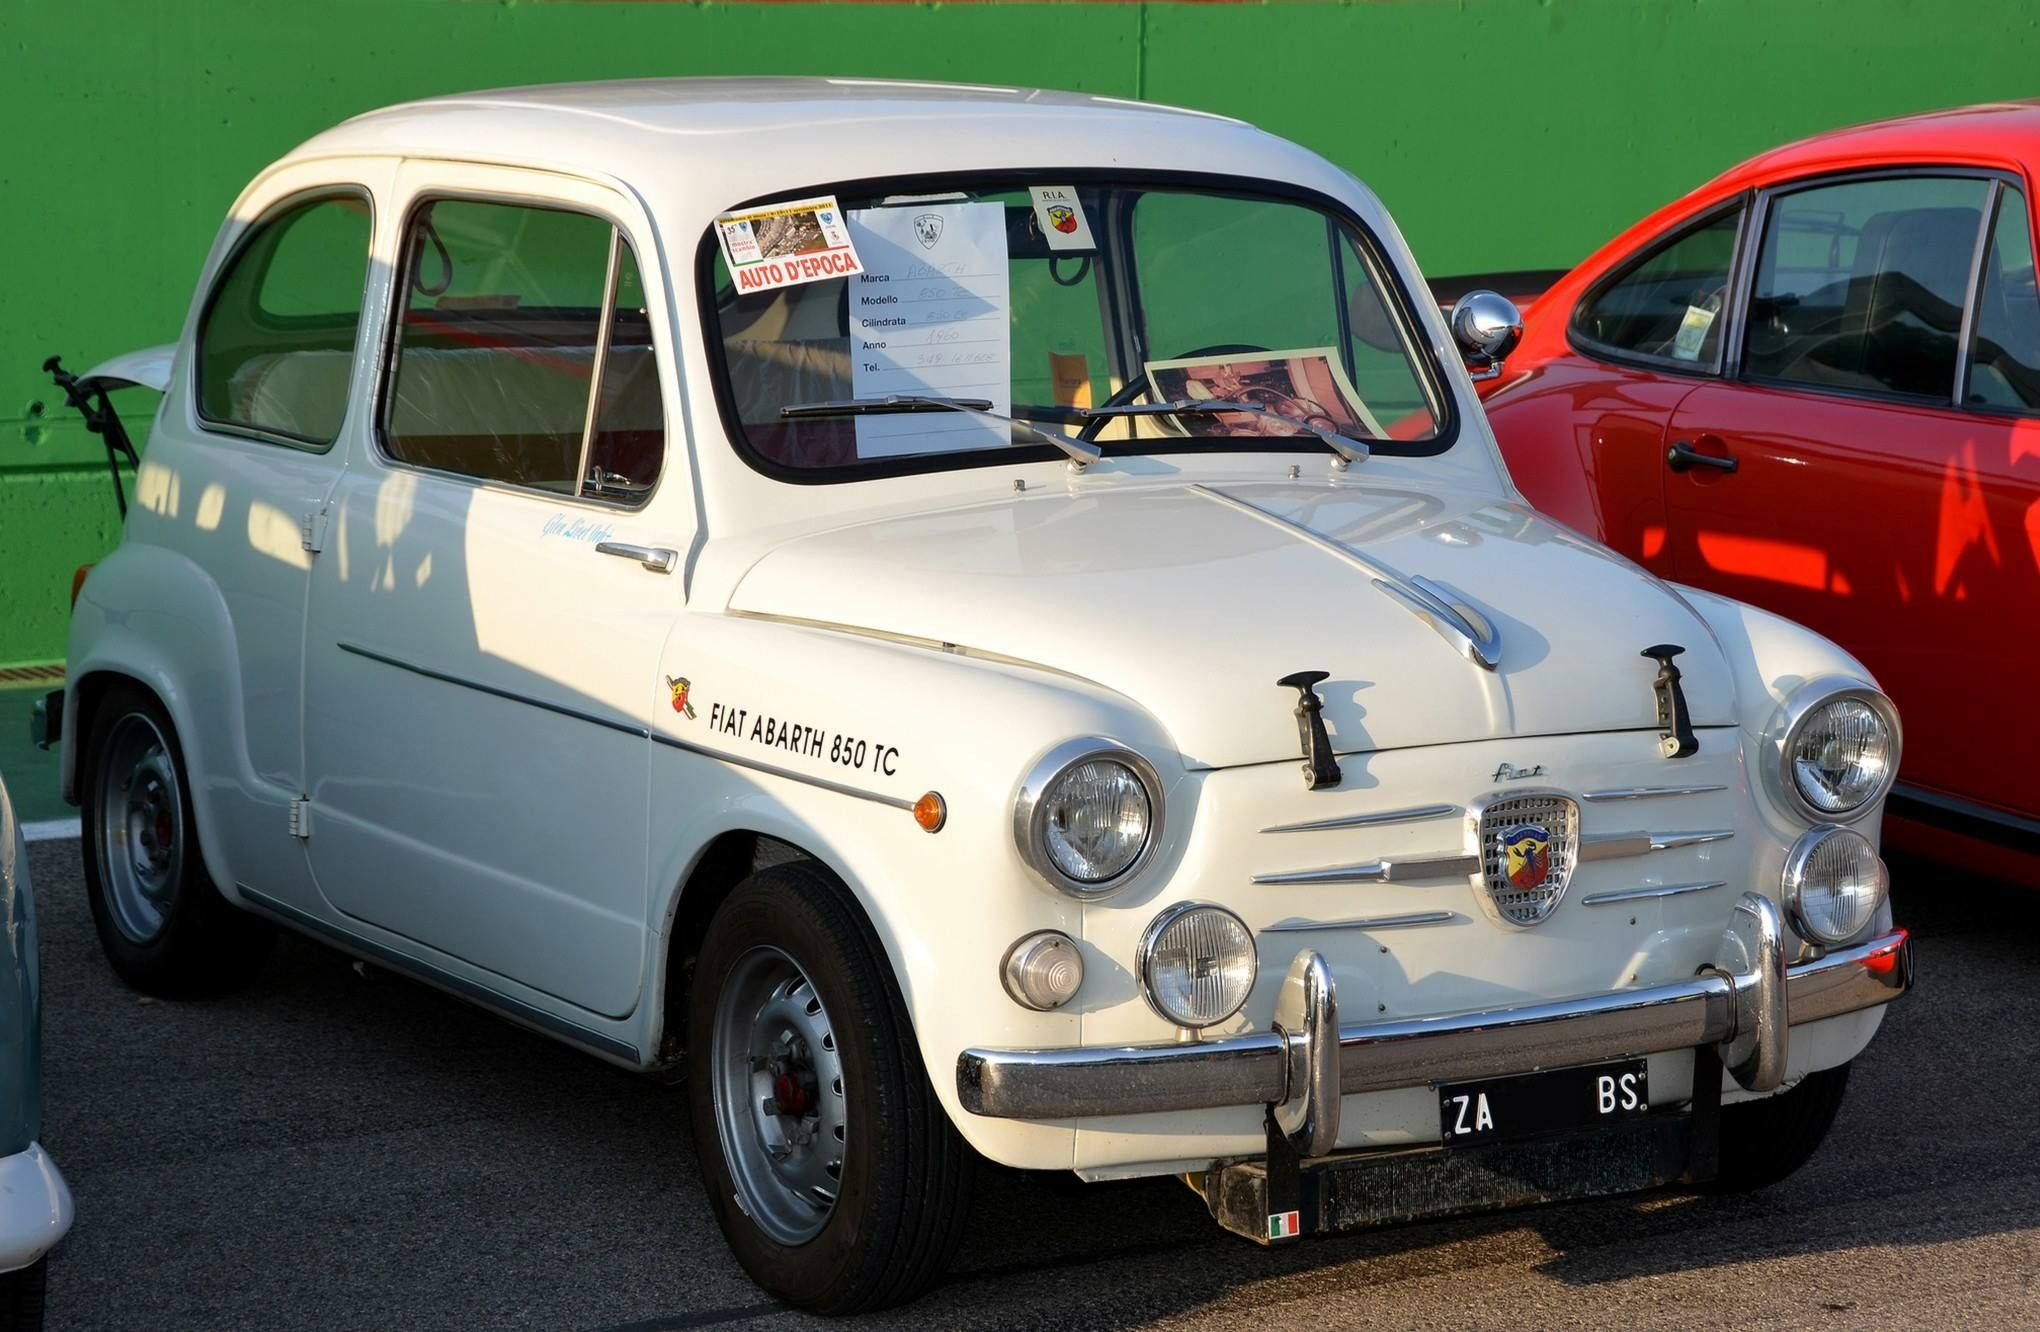 Fiat Abarth 850 Tc Fiat 600 Autos Coches